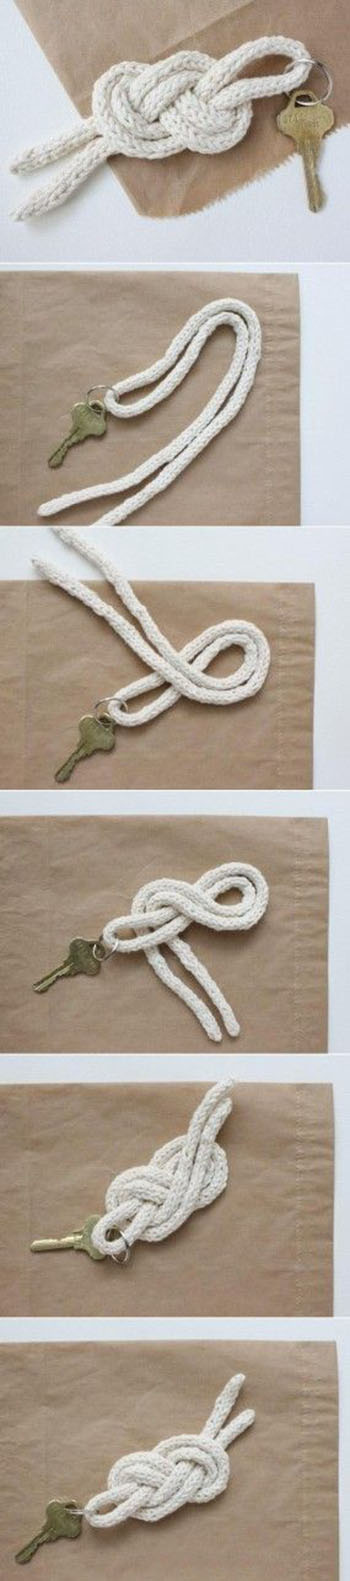 http://www.lotsofdiy.com/diy-key-knot/